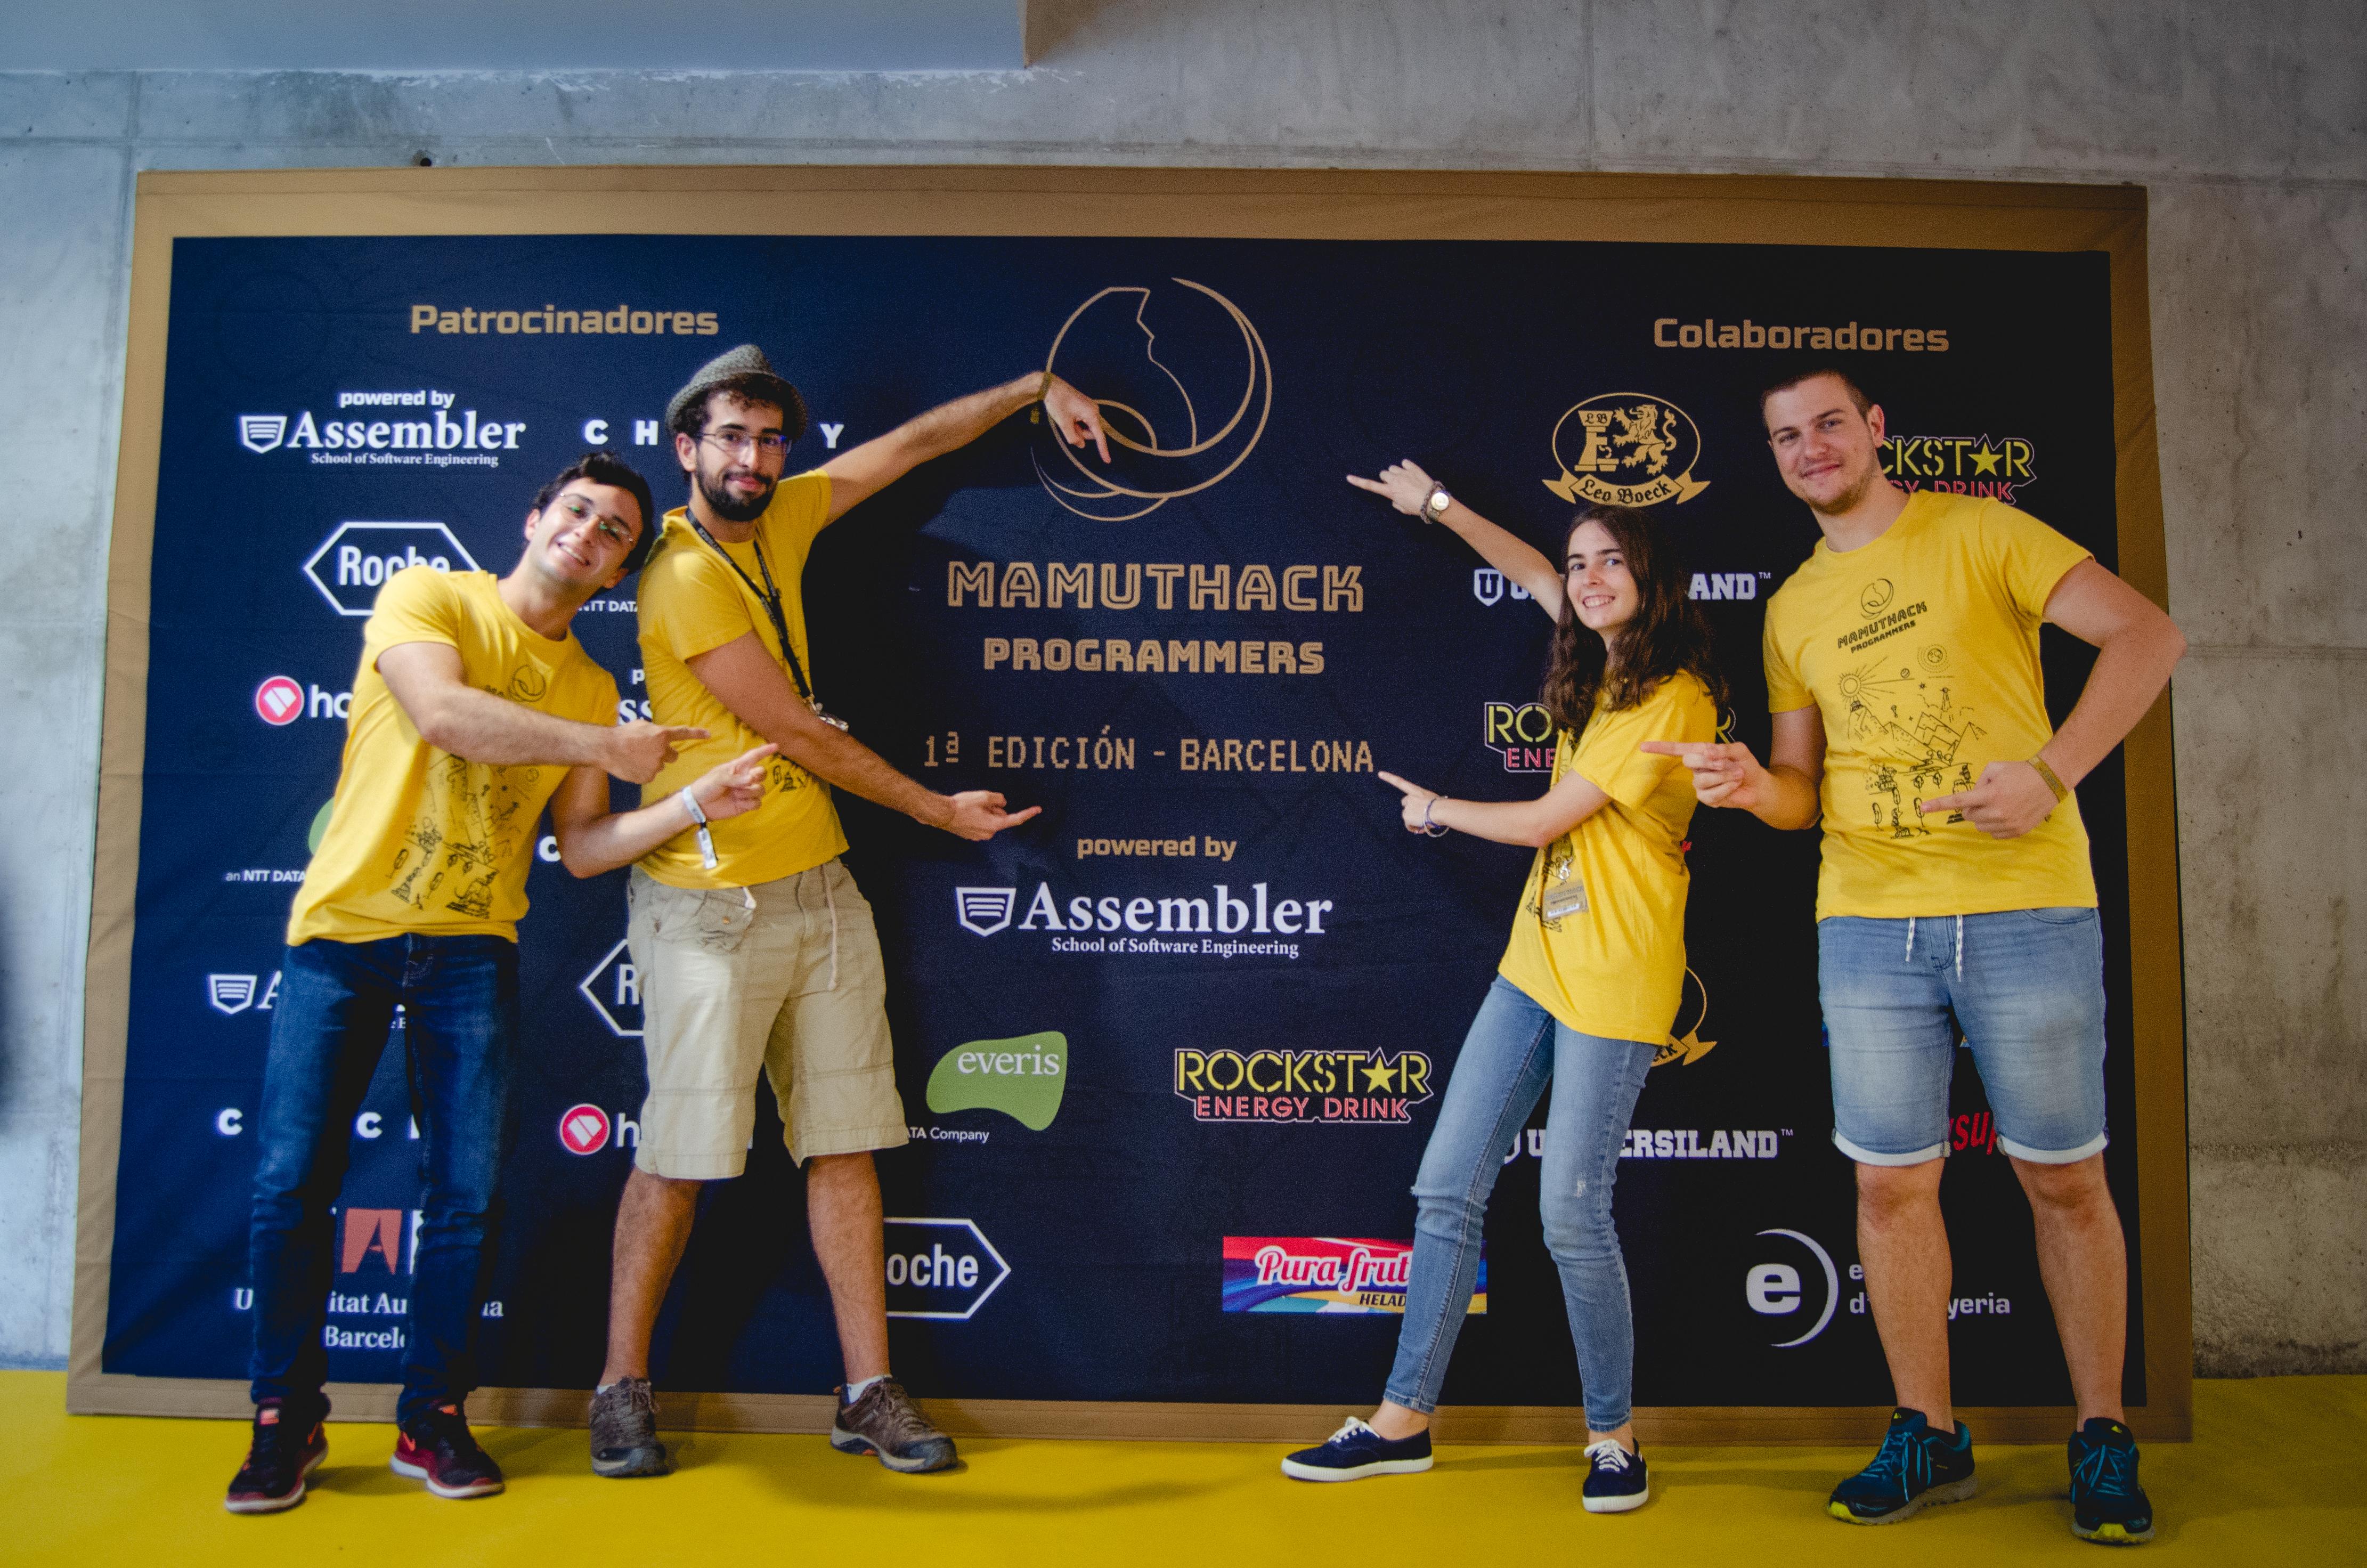 0052_Fotos_mamuthack_mariacasasfoto_20191006